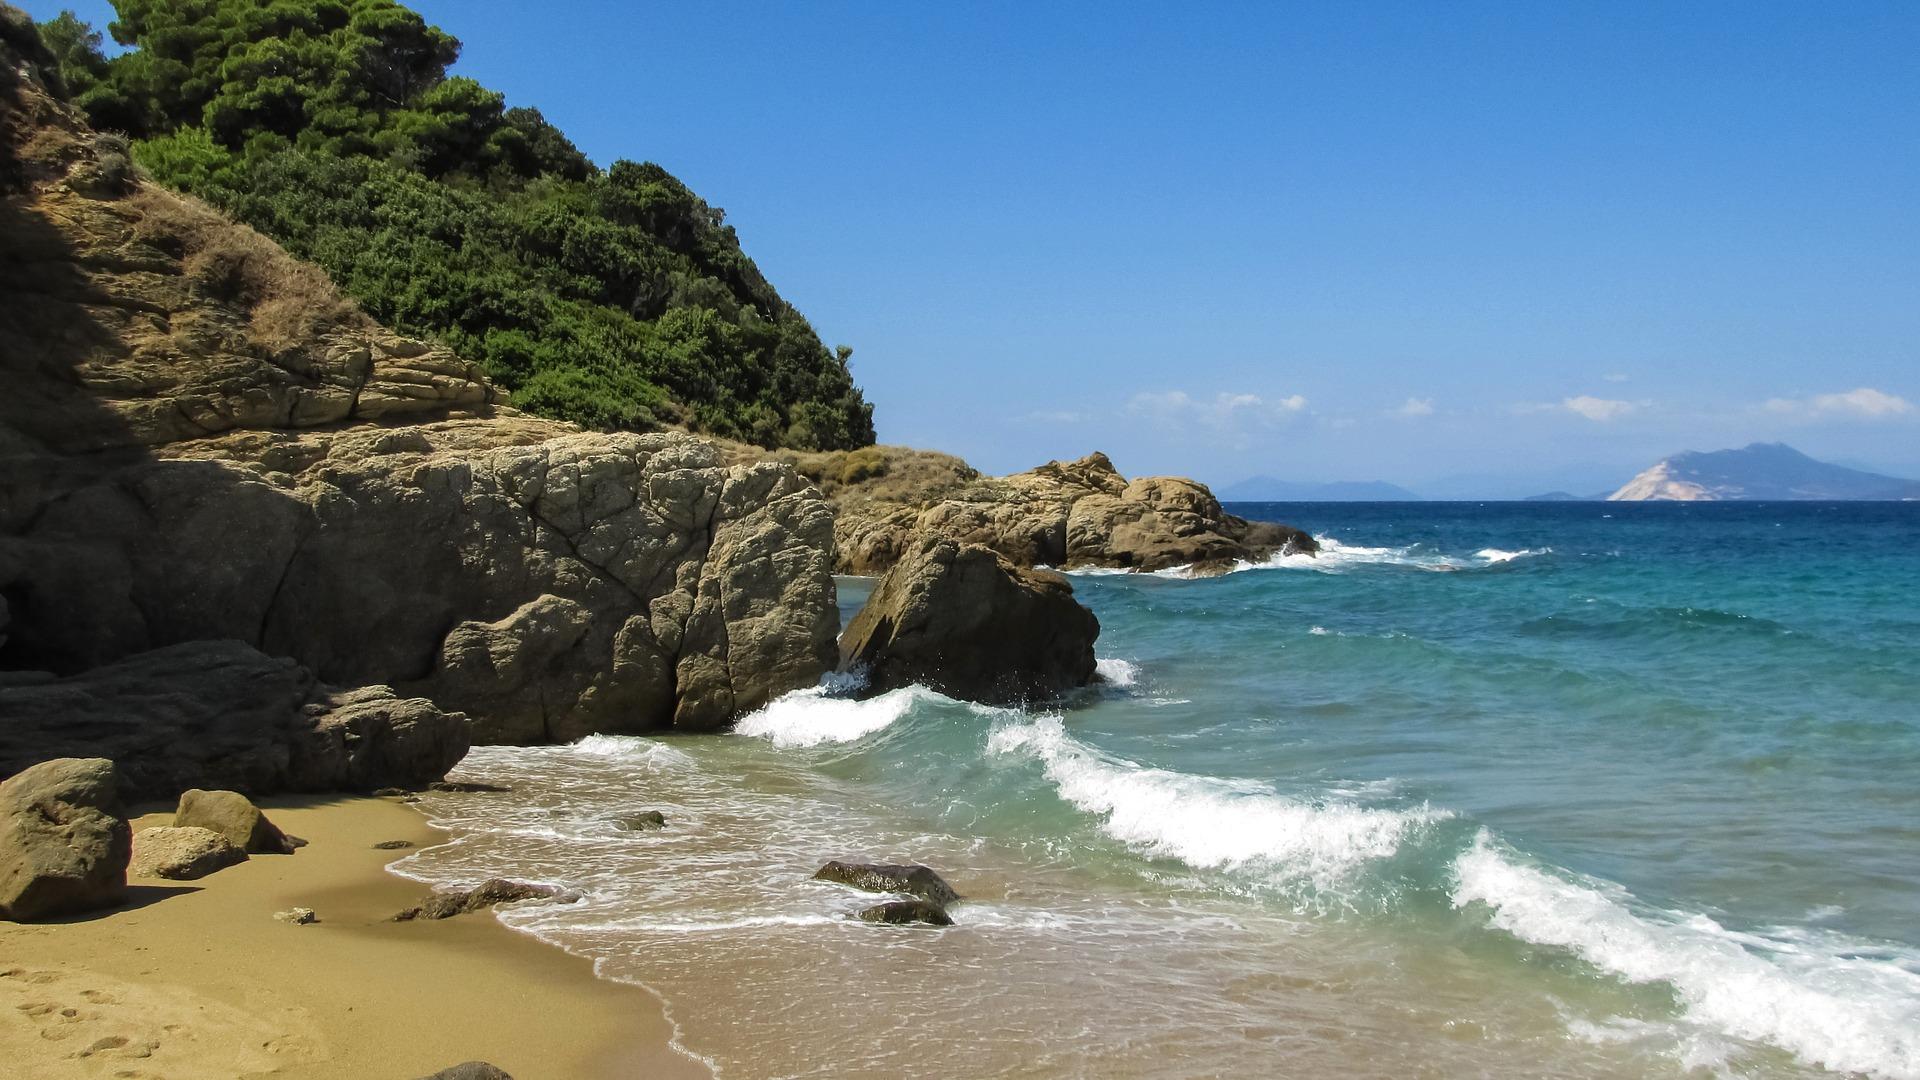 grčka, ostrvo, skiatos, plaže